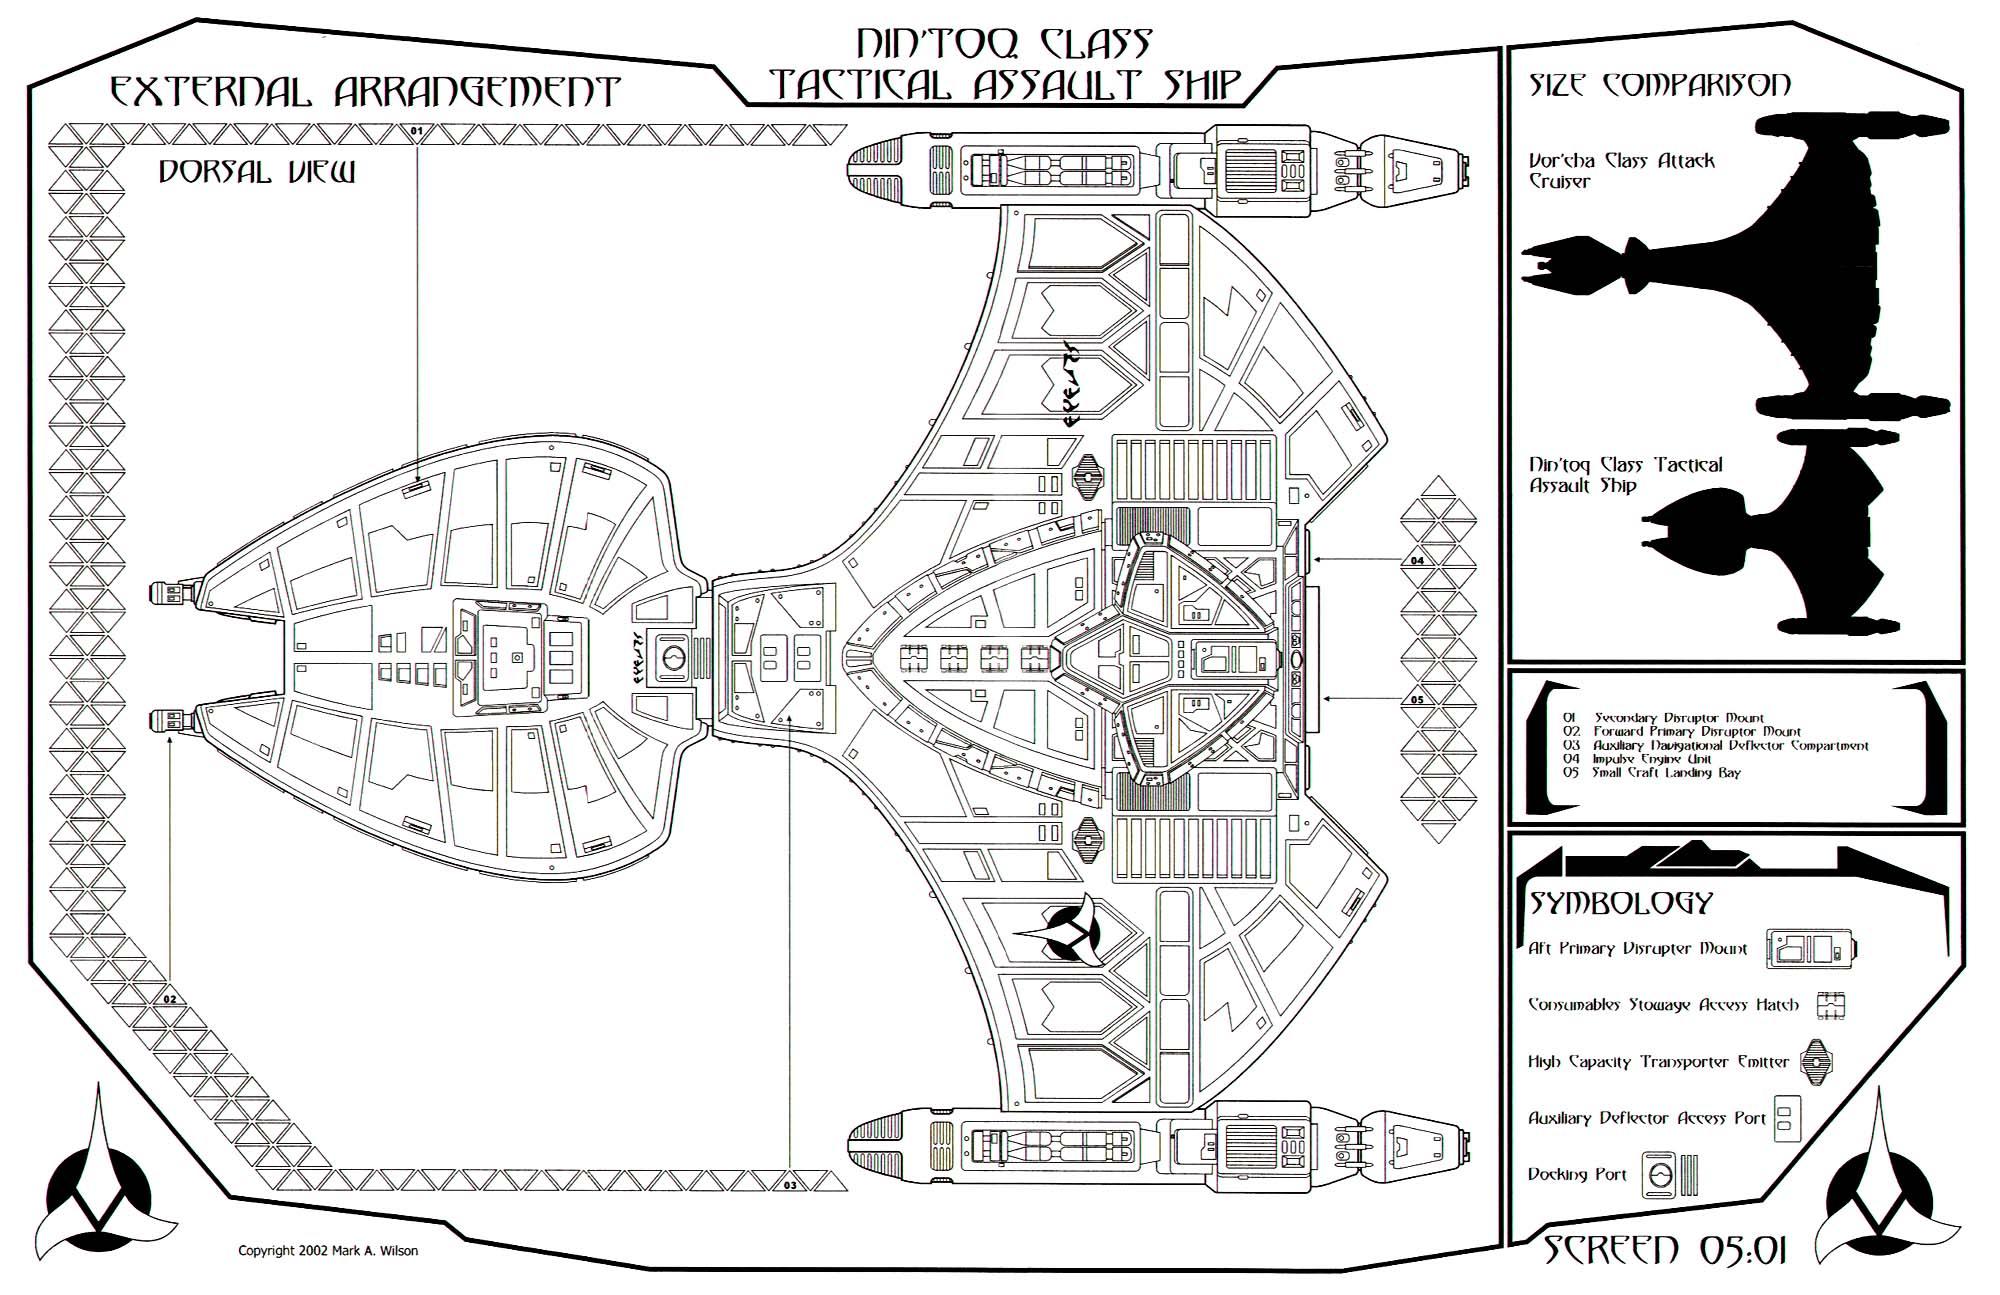 Star Trek Blueprints Klingon Nin Toq Class Tactical